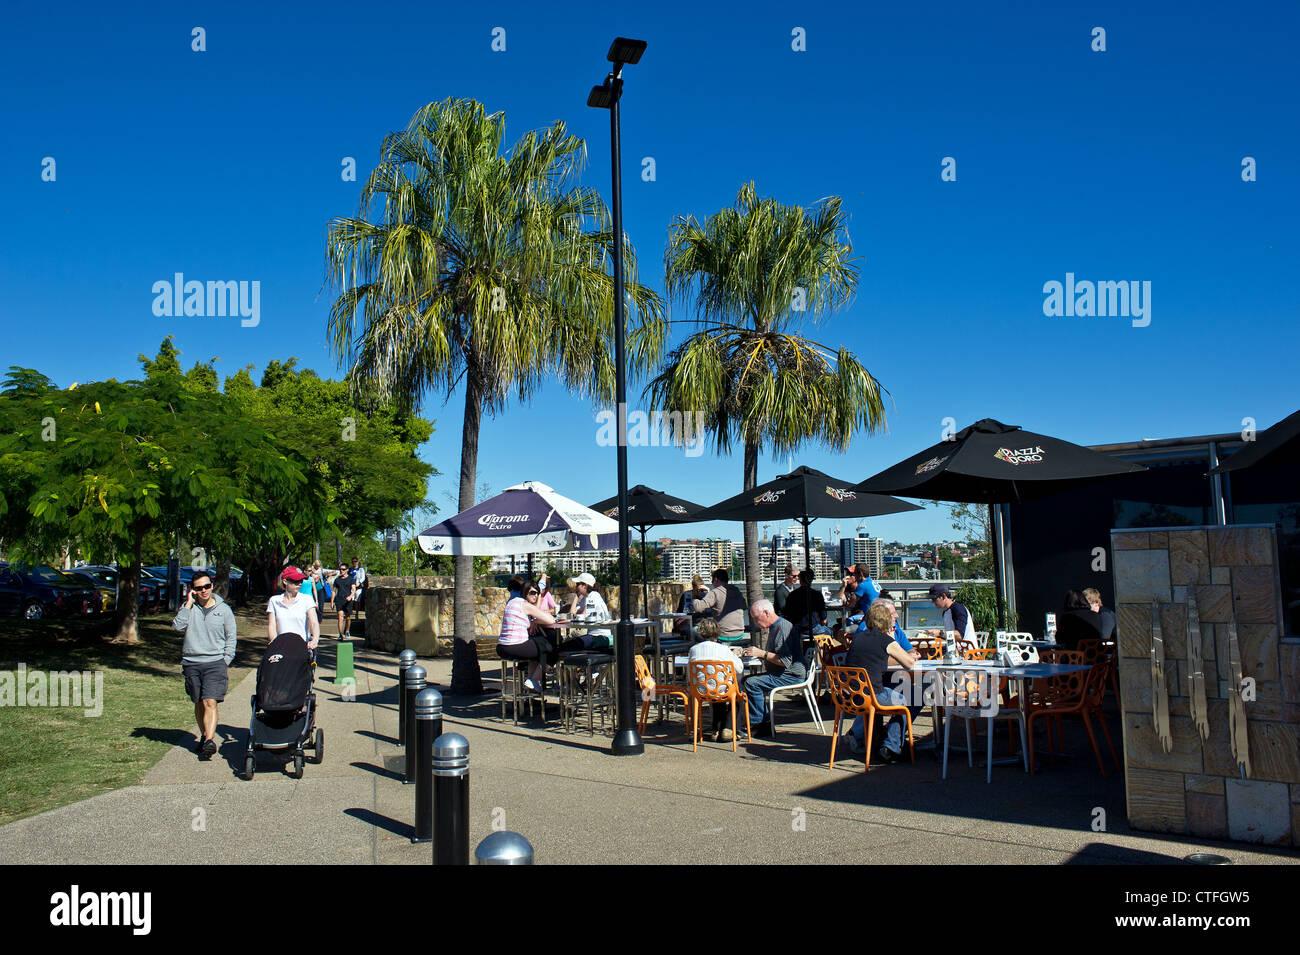 A cafe at Kangaroo Point in Brisbane Australia - Stock Image